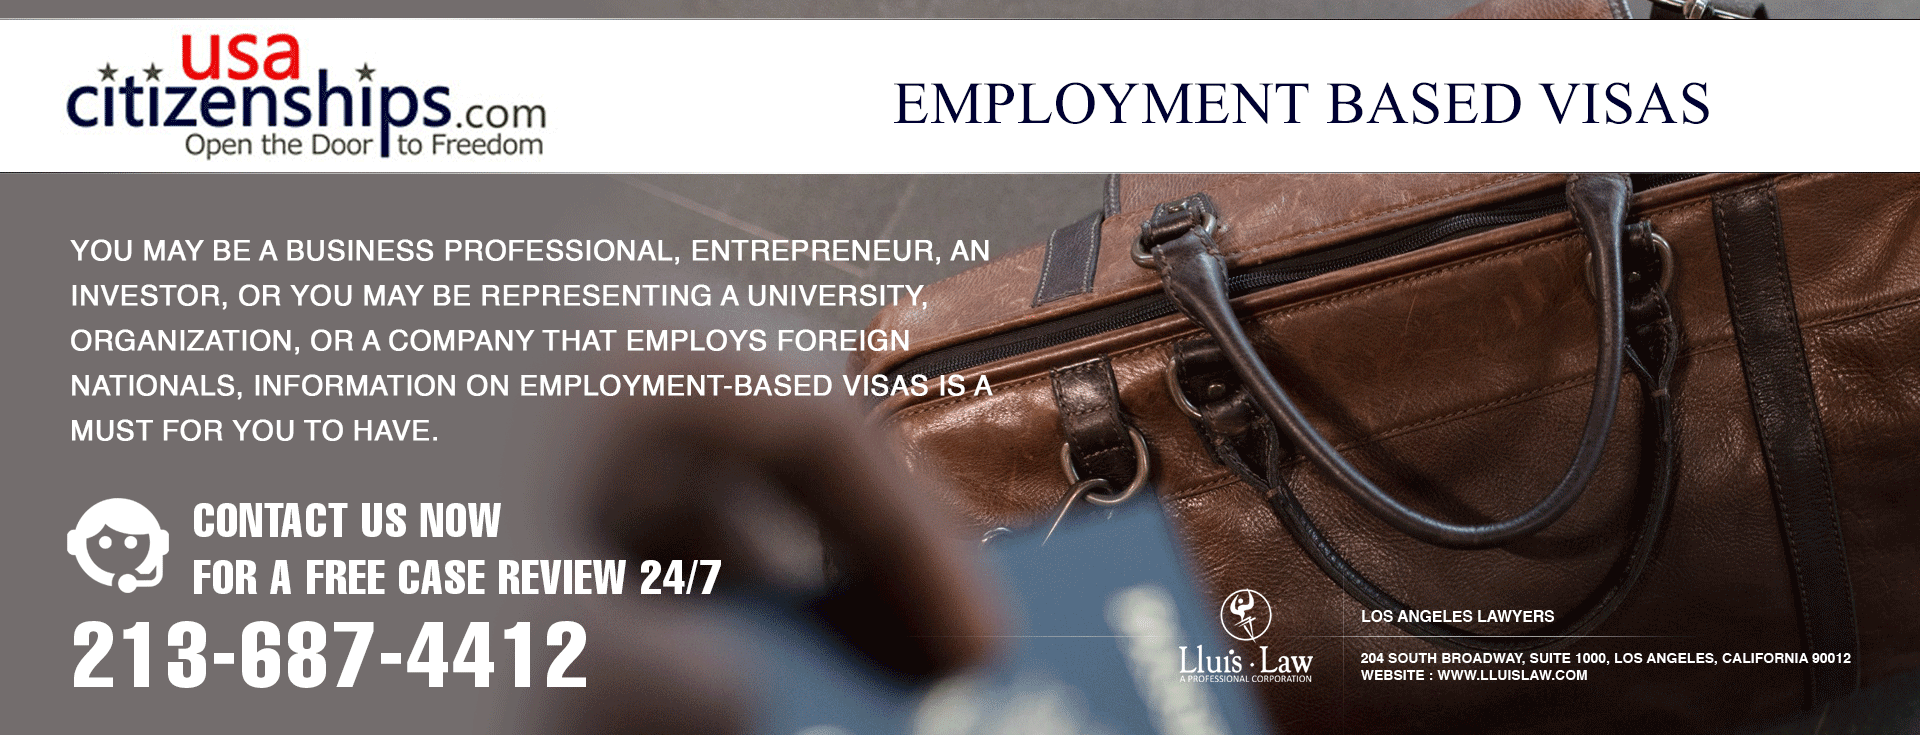 Employment based visa